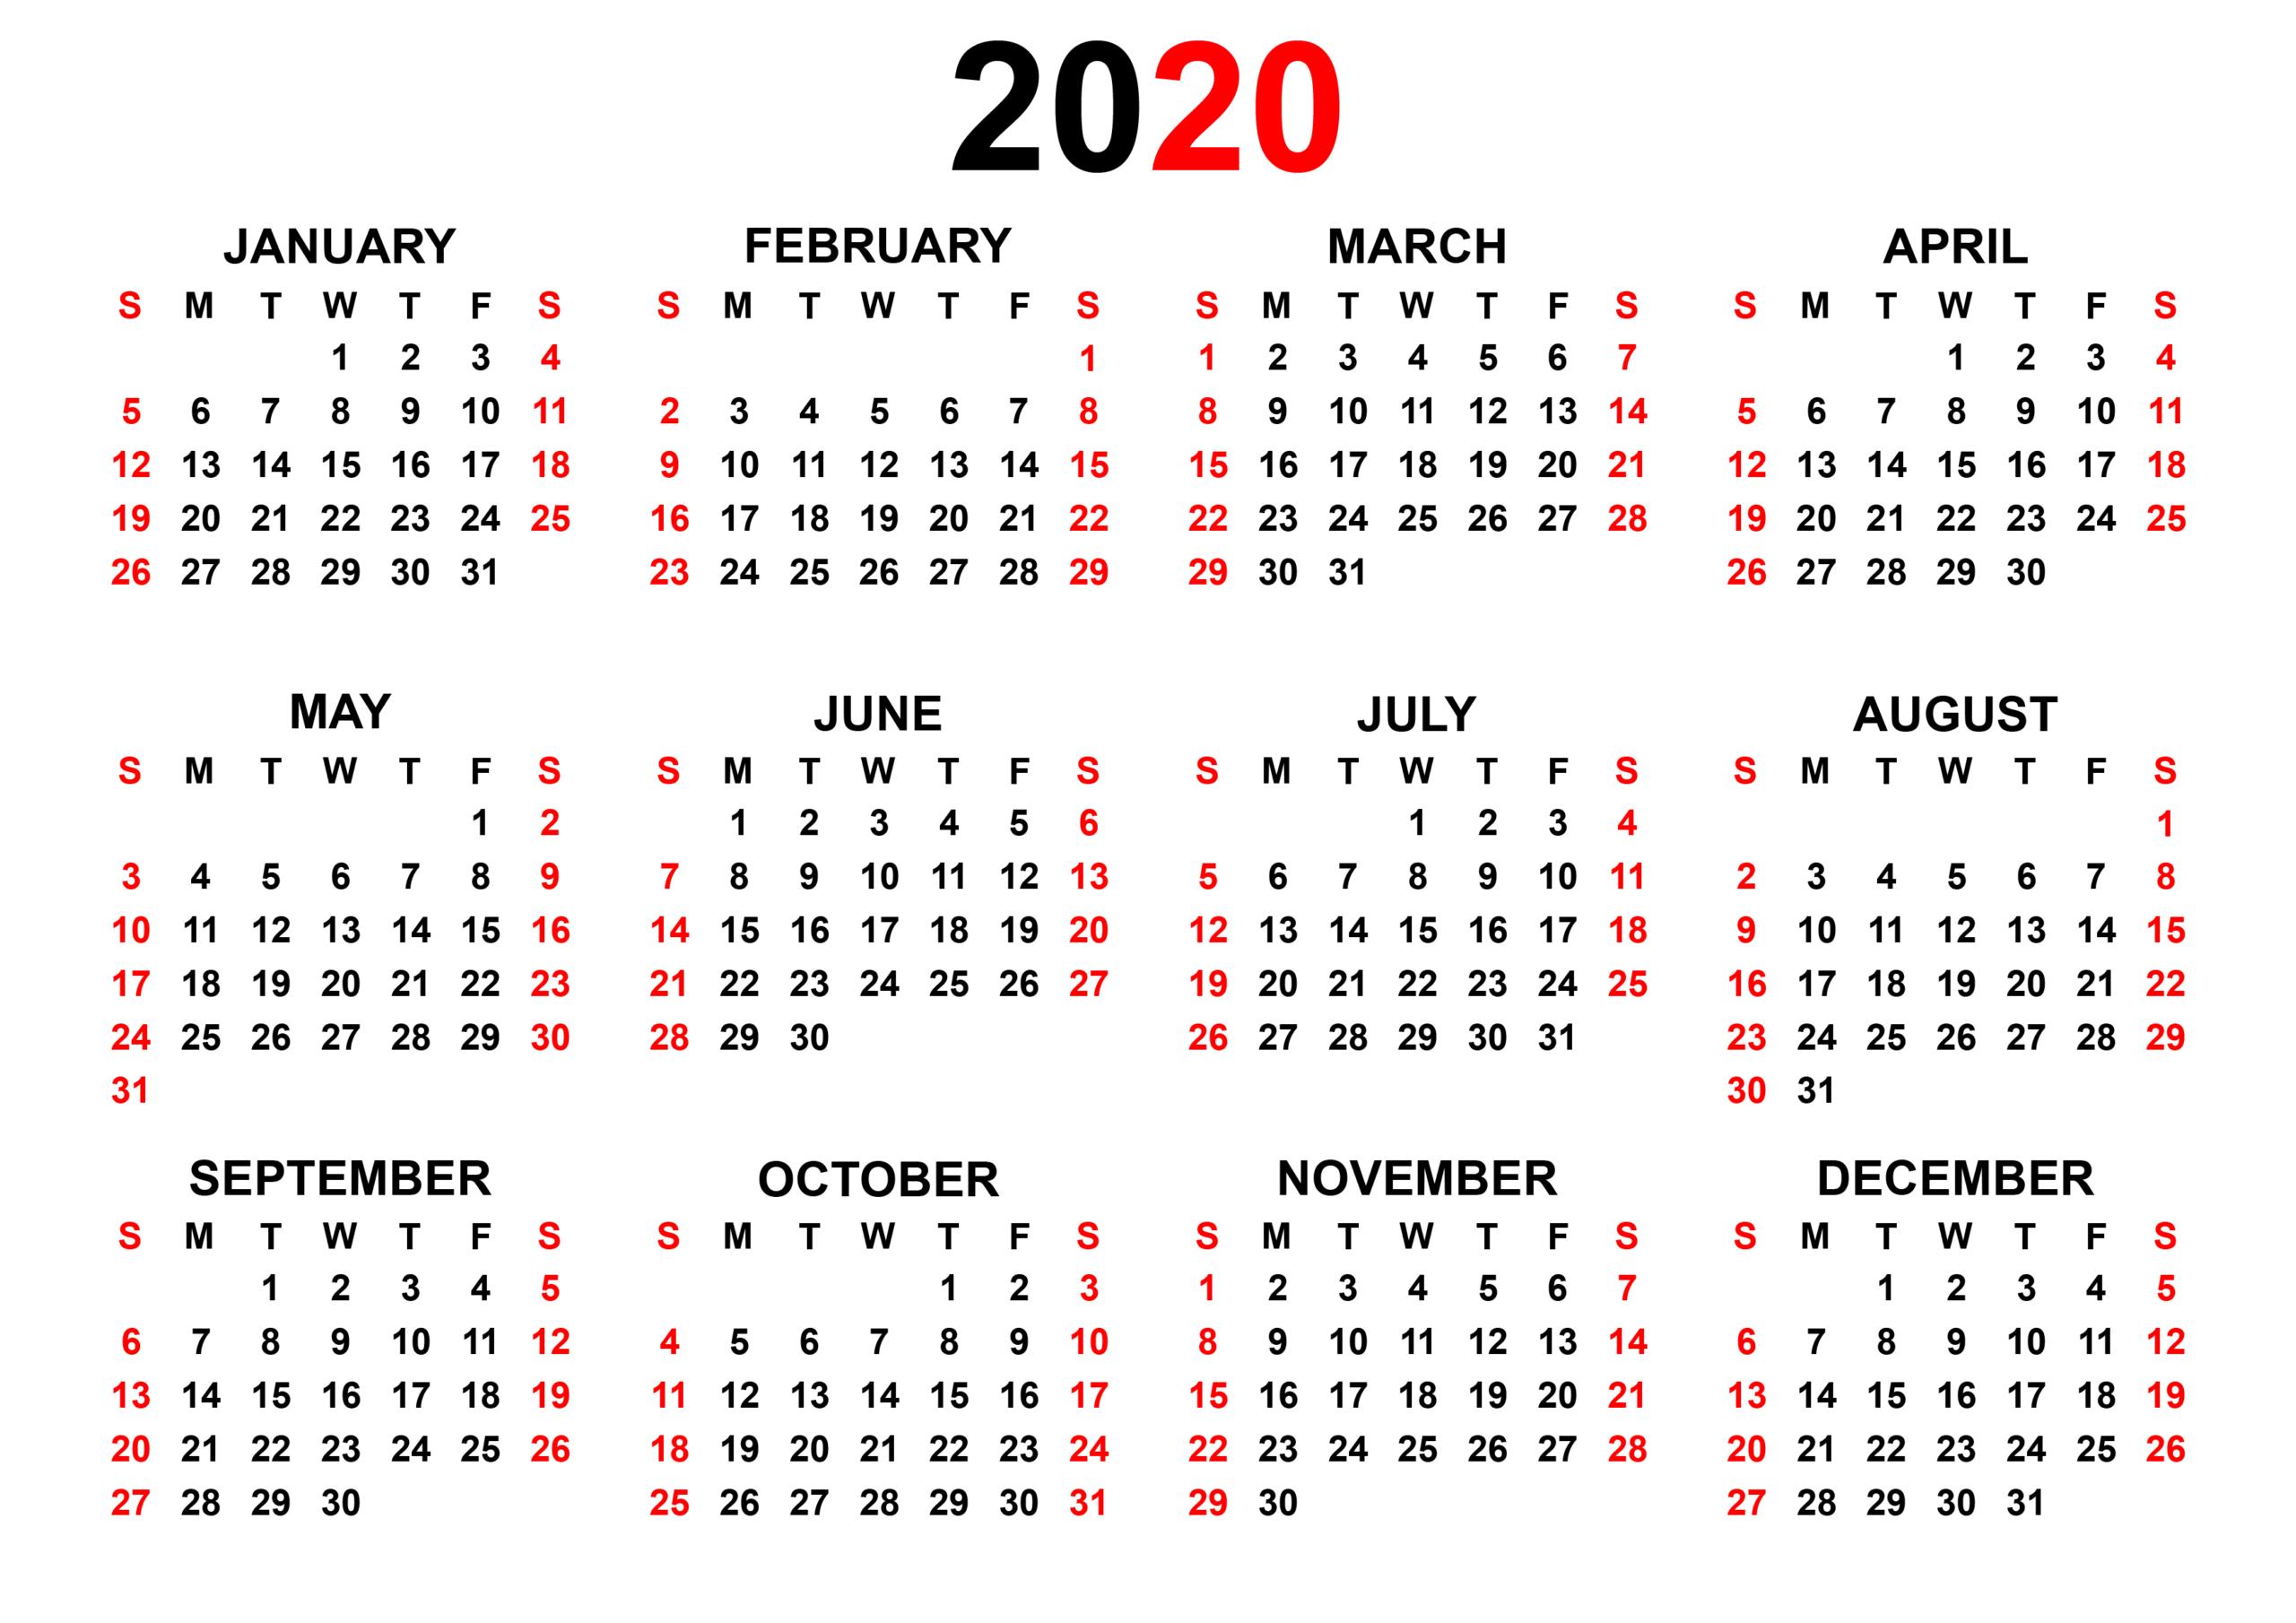 Yearly Calendar 2020  Make Our Schedule | Betacalender4U regarding Most Goals Calendar Year